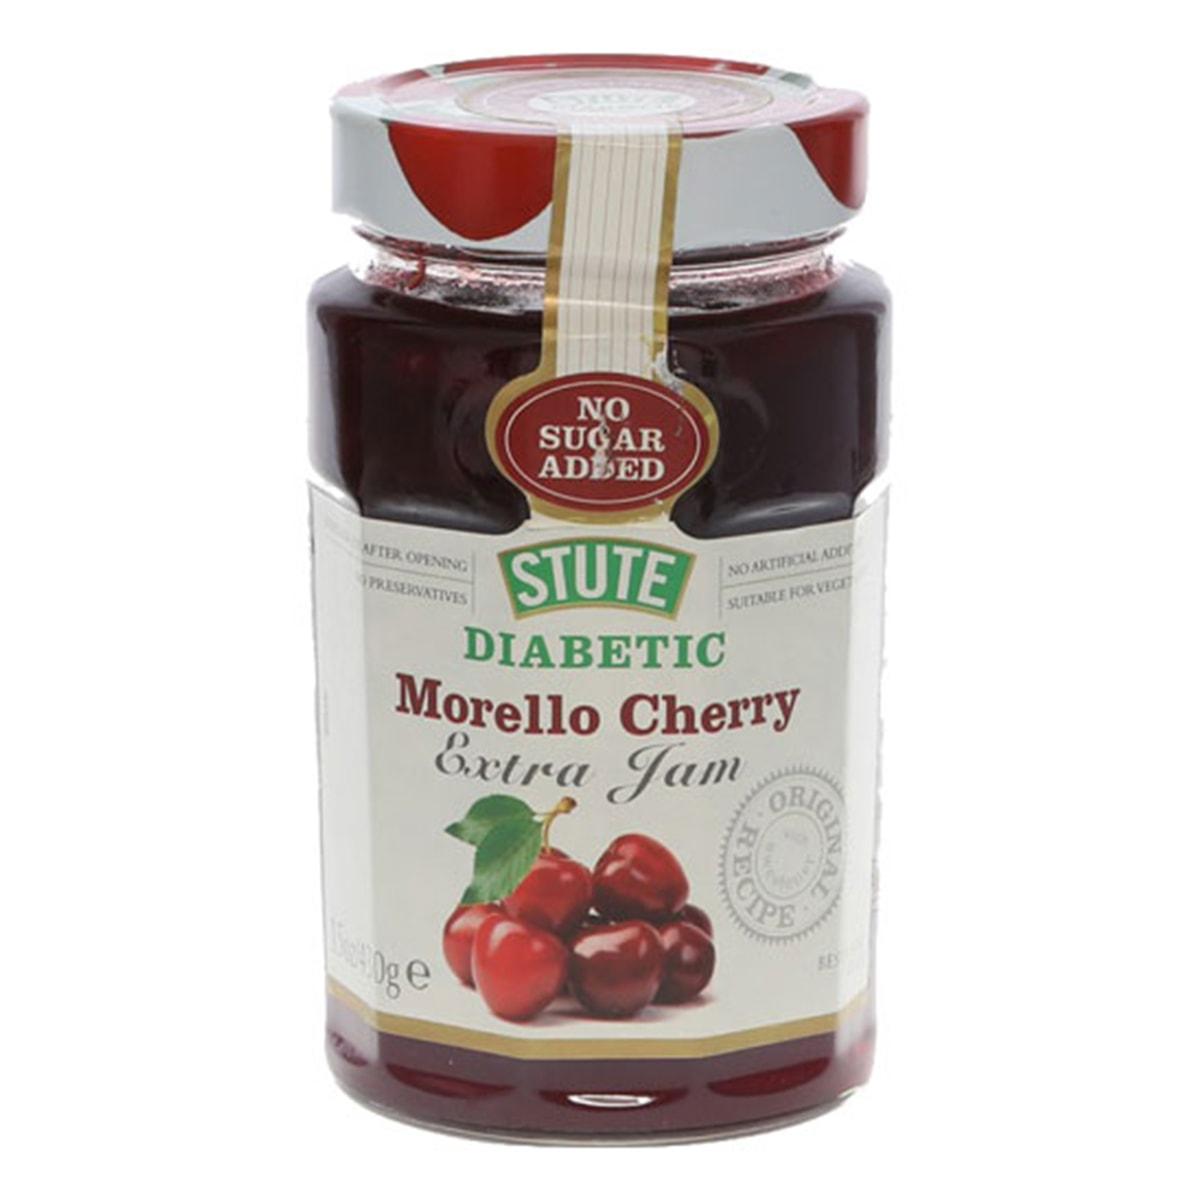 Buy Stute Diabetic Morello Cherry Extra Jam (No Sugar Added) - 430 gm